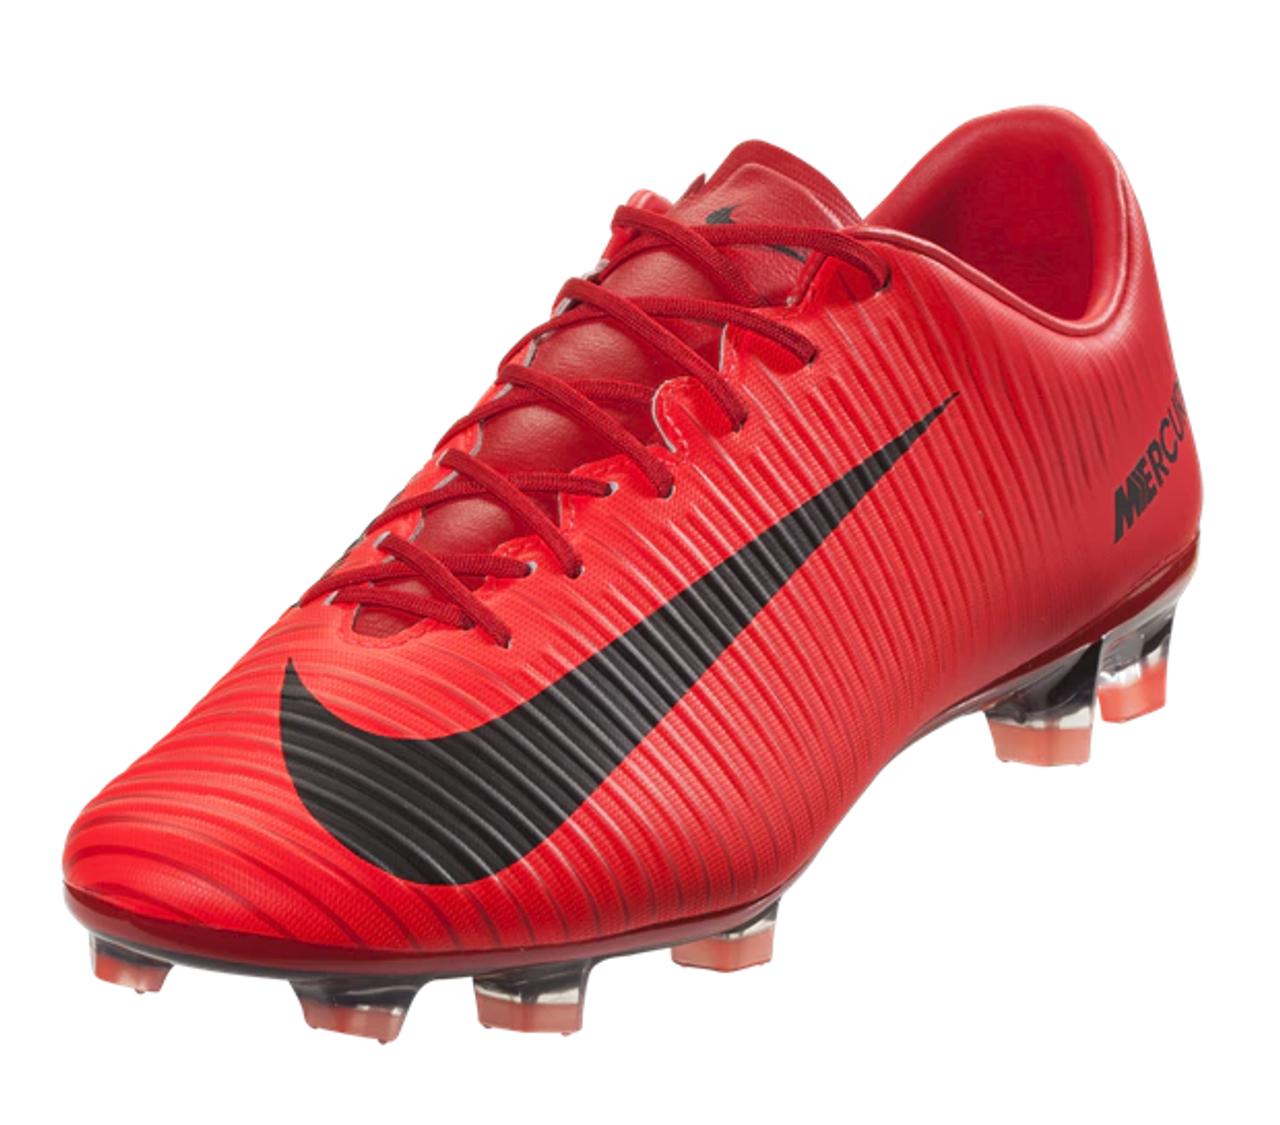 ec519ef999f9 Nike Mercurial Veloce III FG - University Red/Black (121517) - ohp soccer